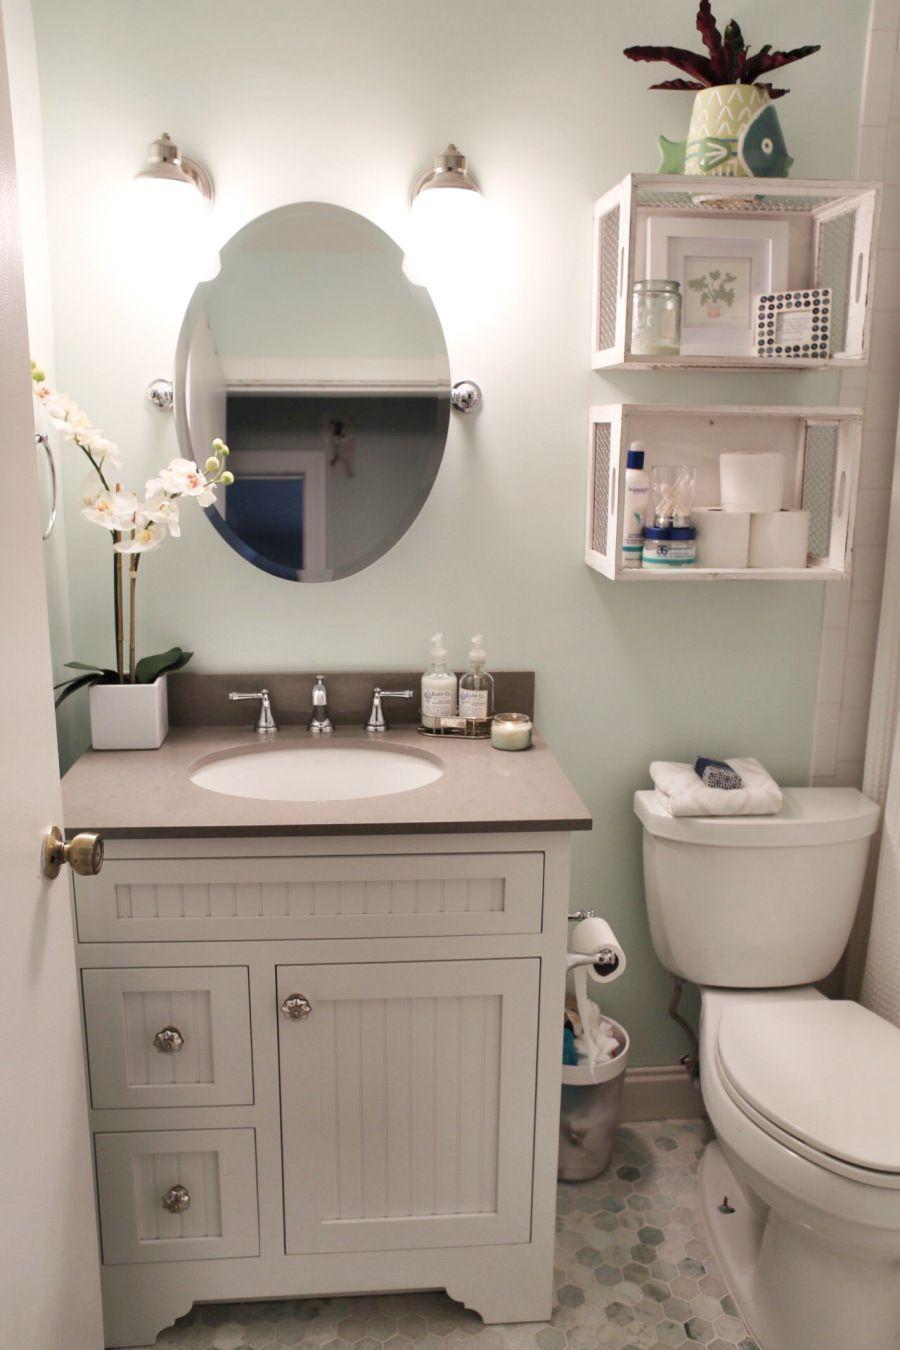 54 half bathroom ideas for beautiful bathroom design on a - Half bath ideas on a budget ...